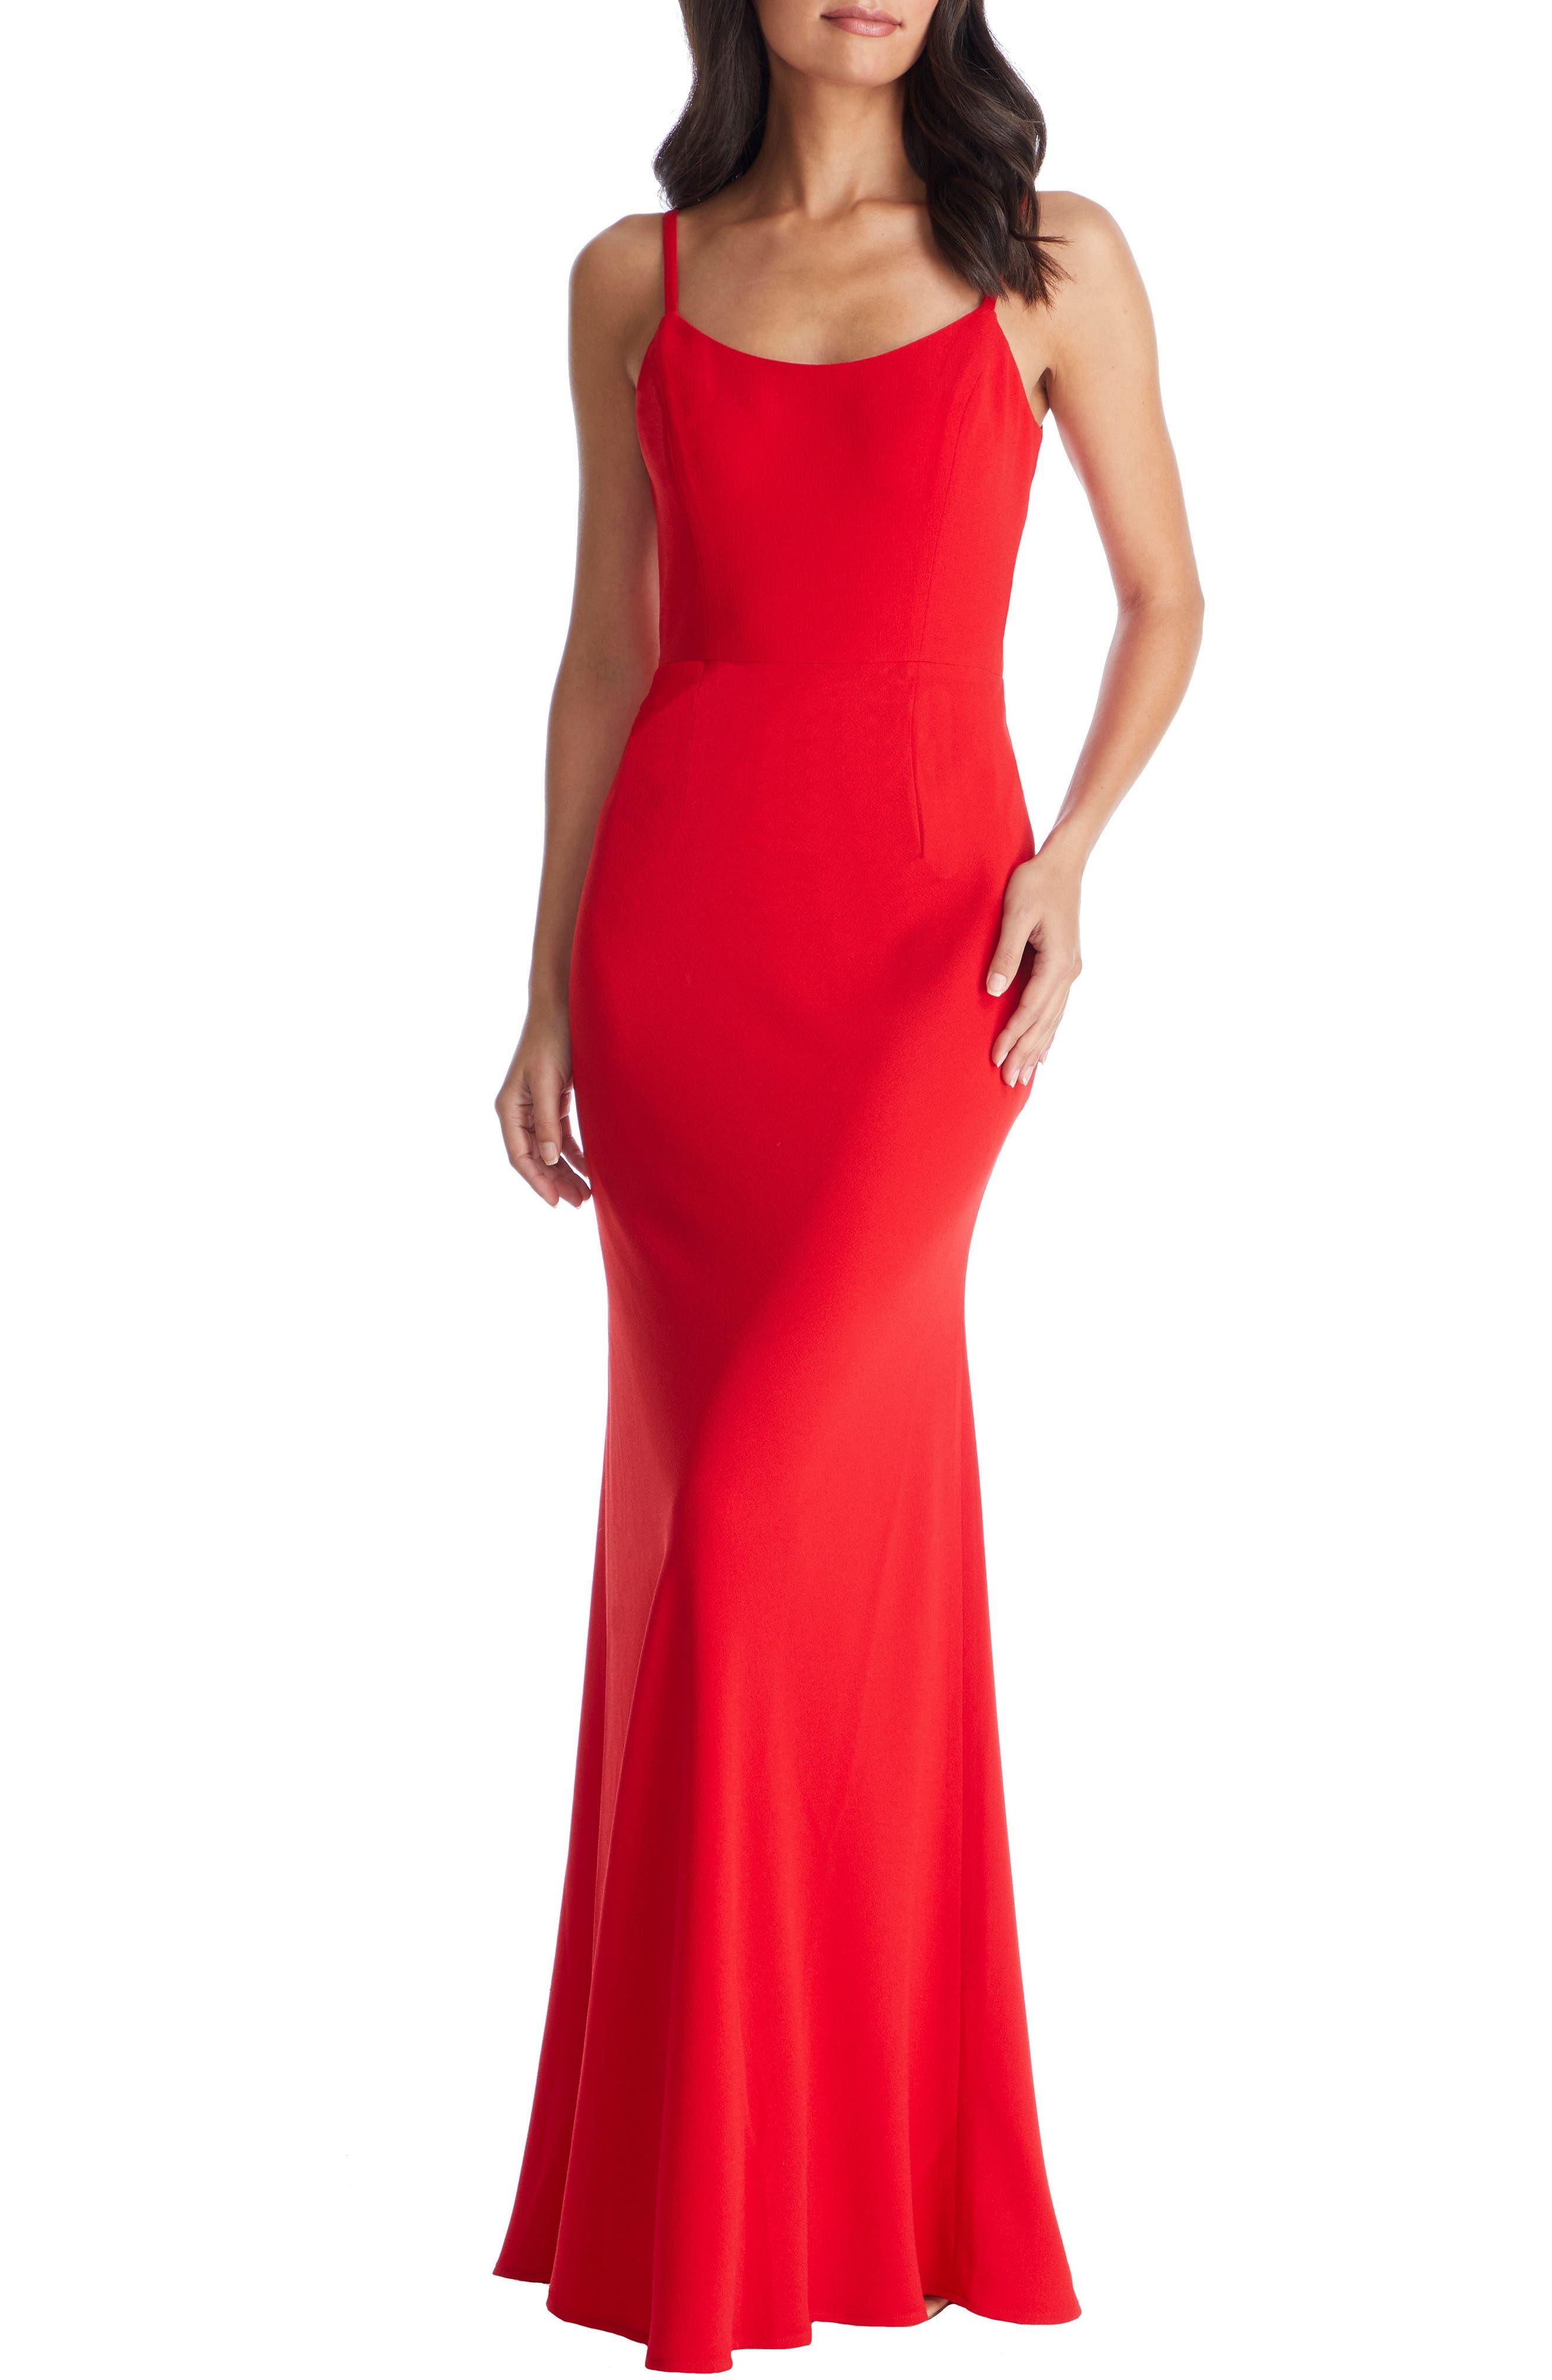 Dress The Population Jodi Crepe Evening Dress, Red